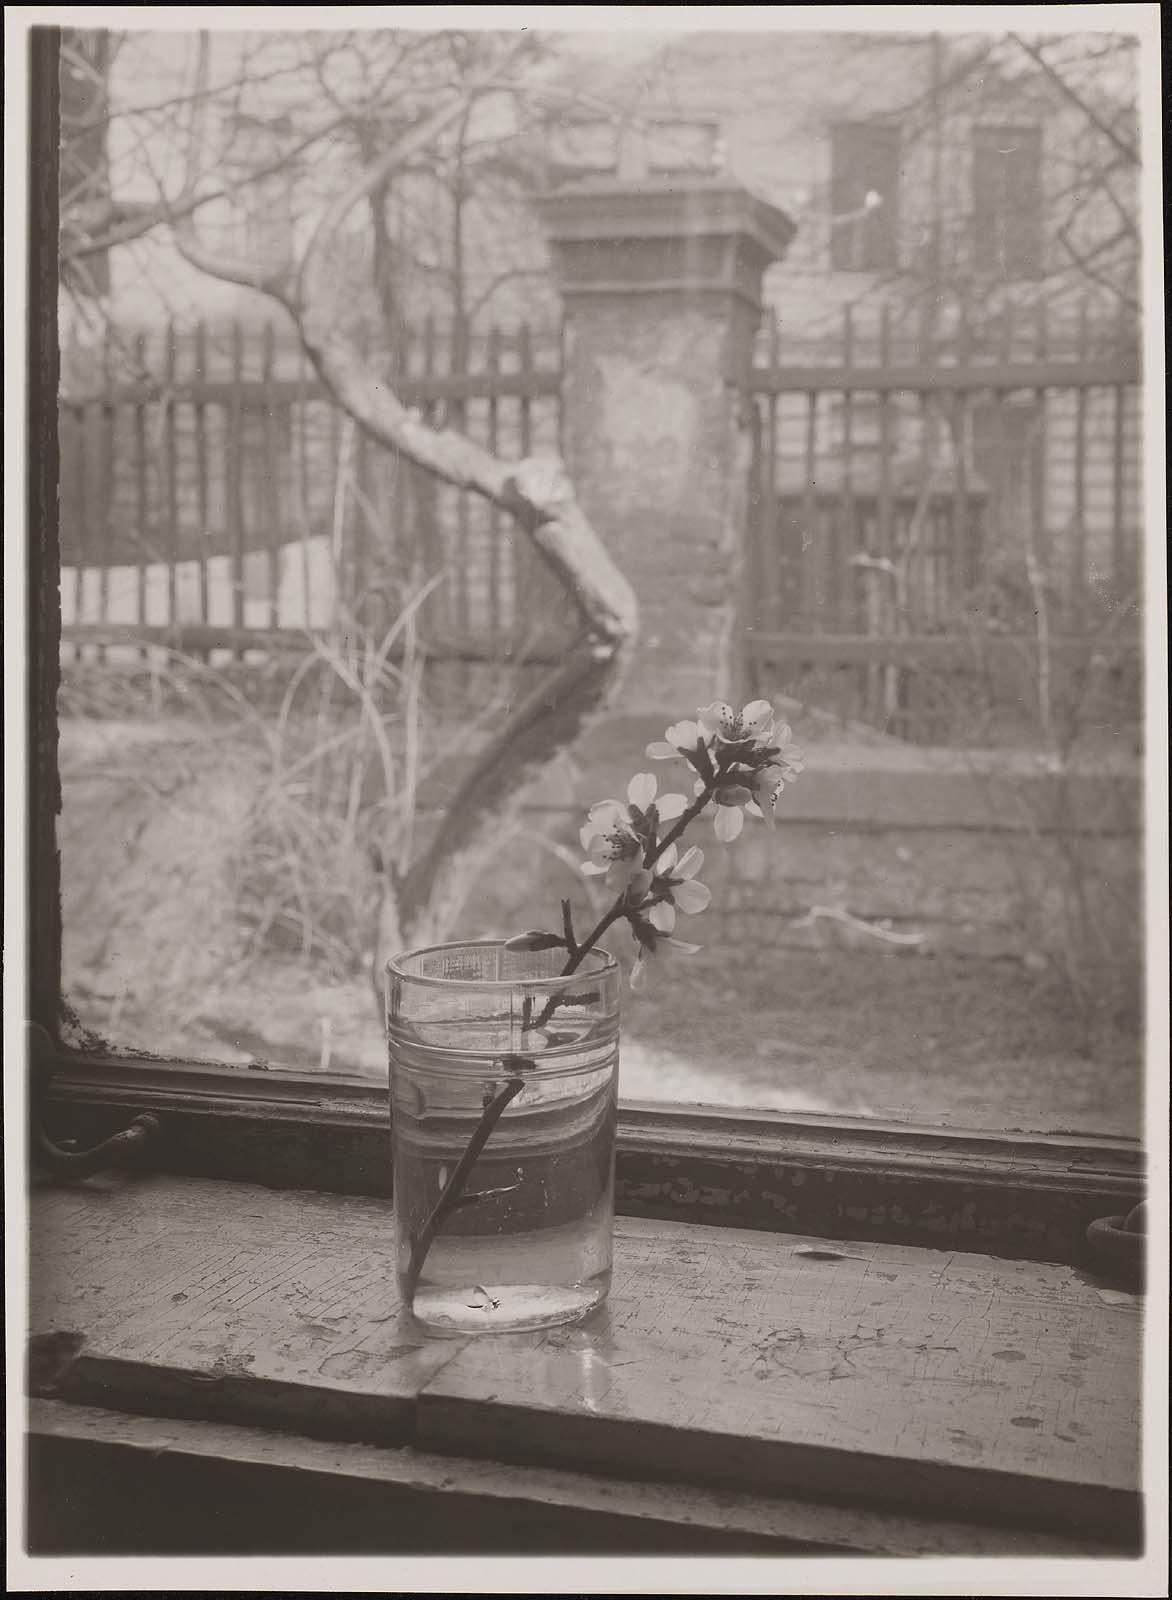 Josef sudek object photography alfred stieglitz great photographers commercial photography prague